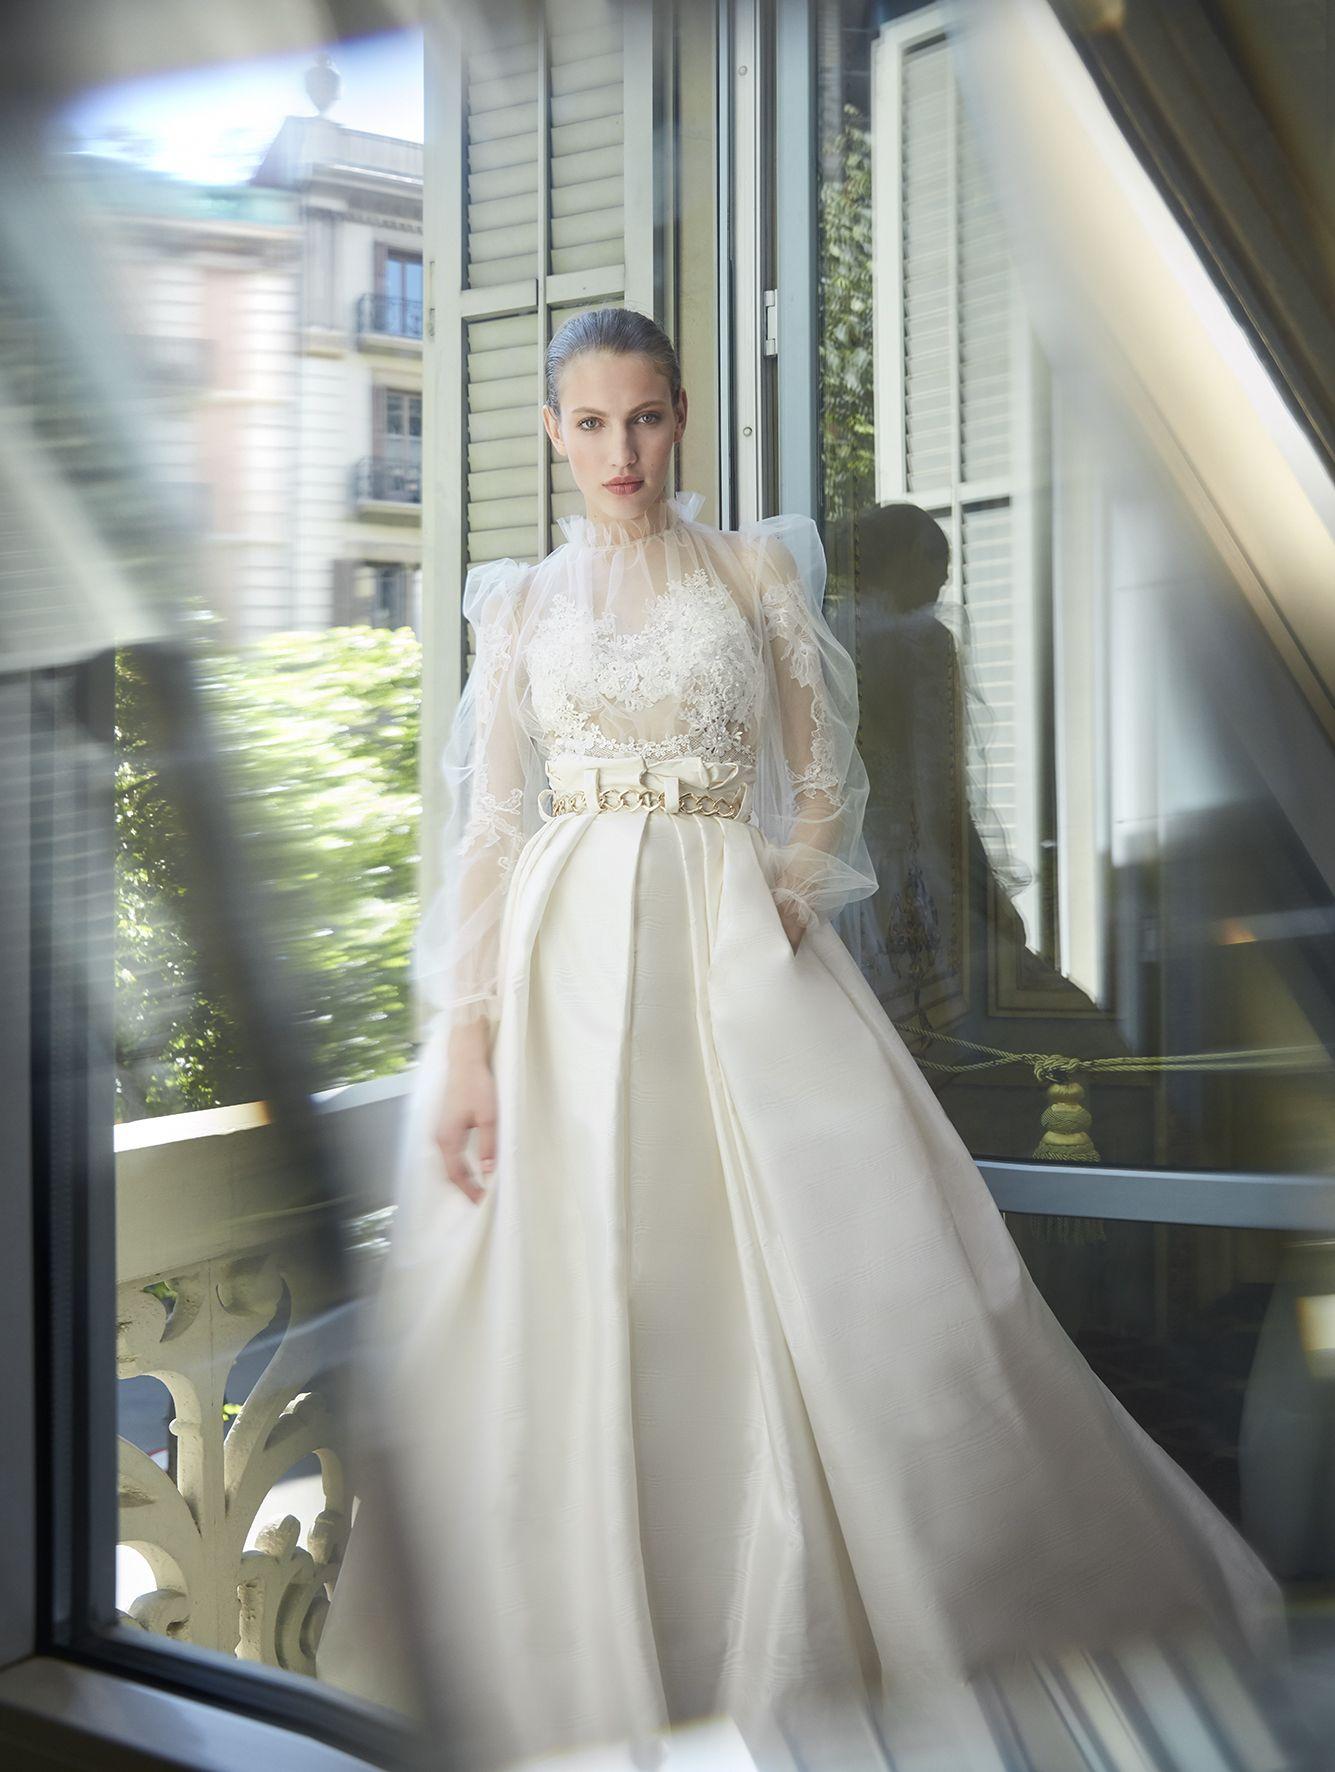 Yolancris highfashion couture brides wedding